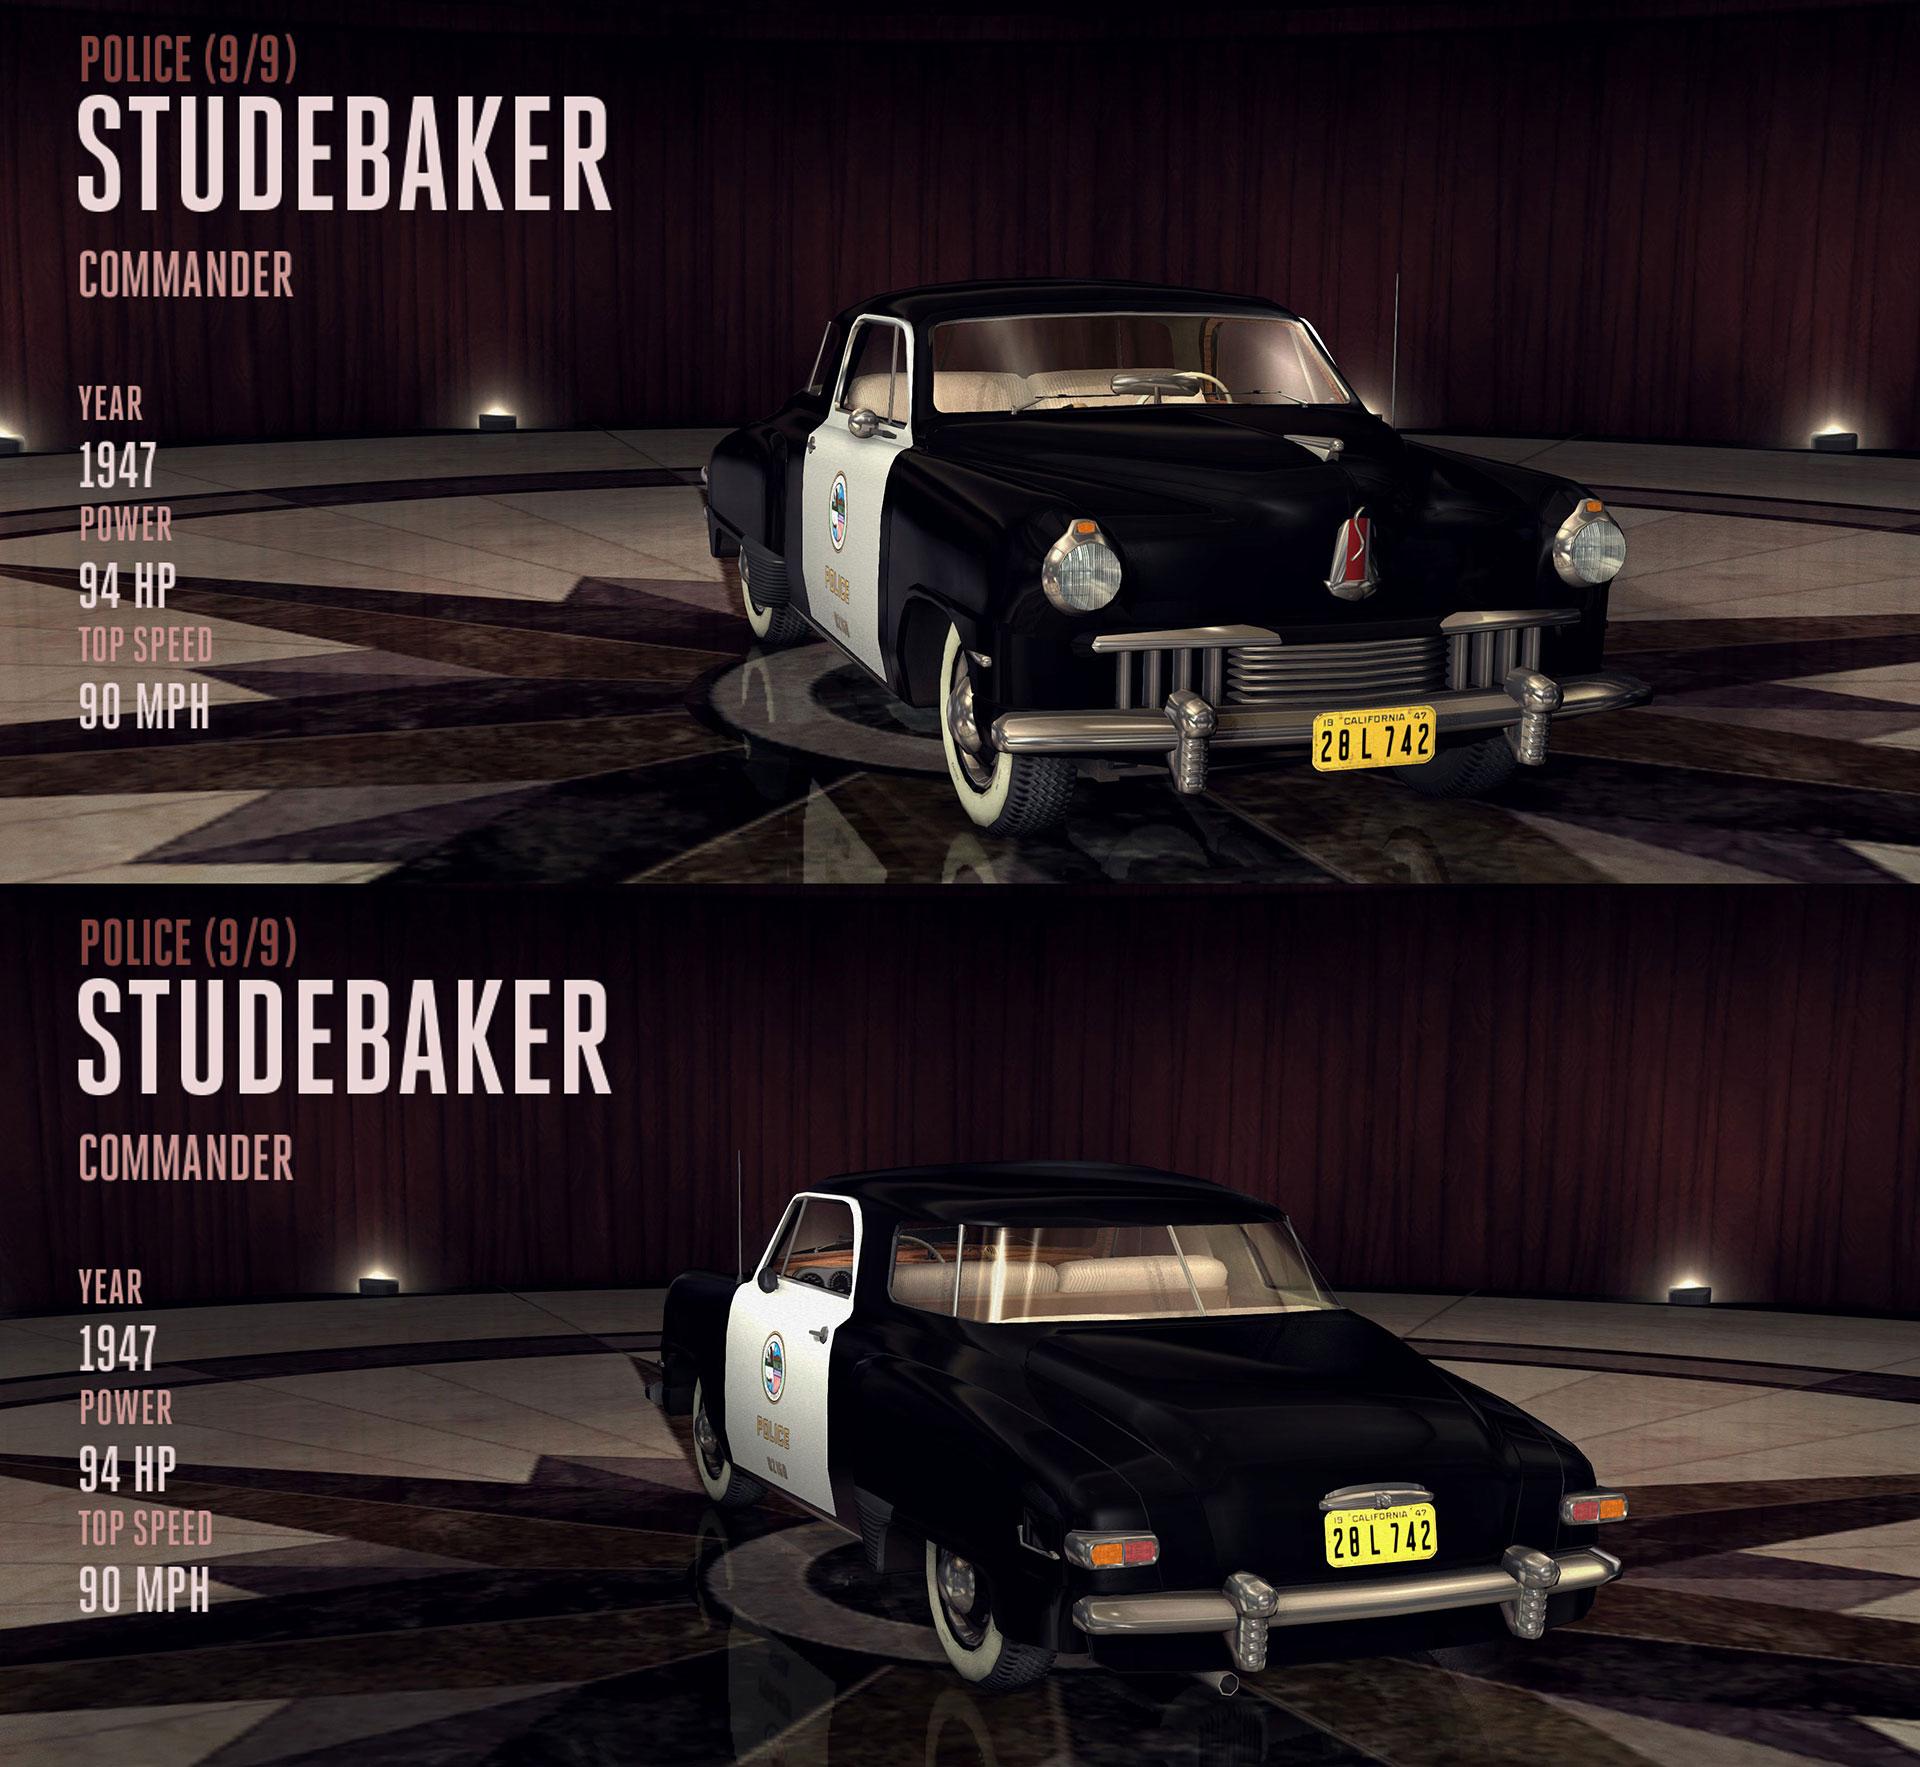 Studebaker Commander (Police)